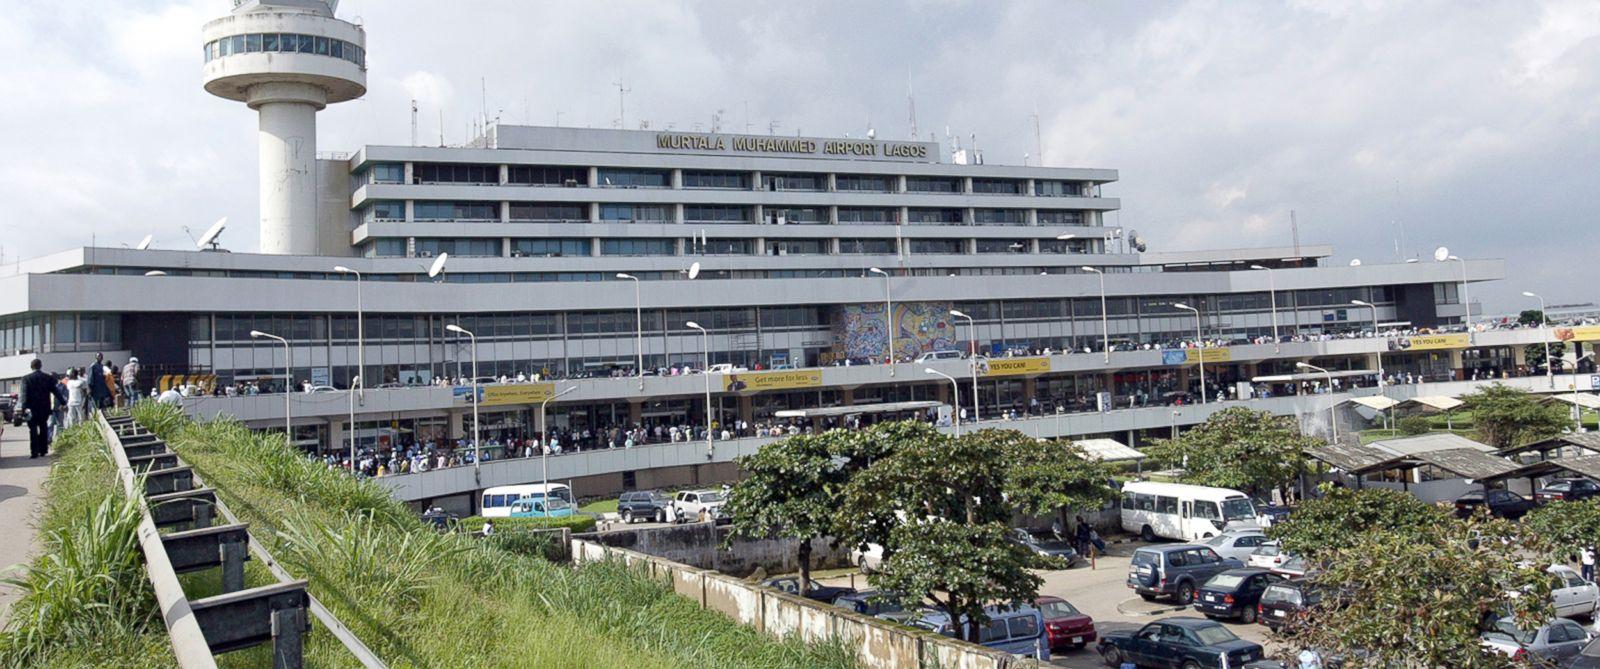 PHOTO: Murtala Muhammed International Airport in Lagos, Nigeria, Sept. 11, 2007.